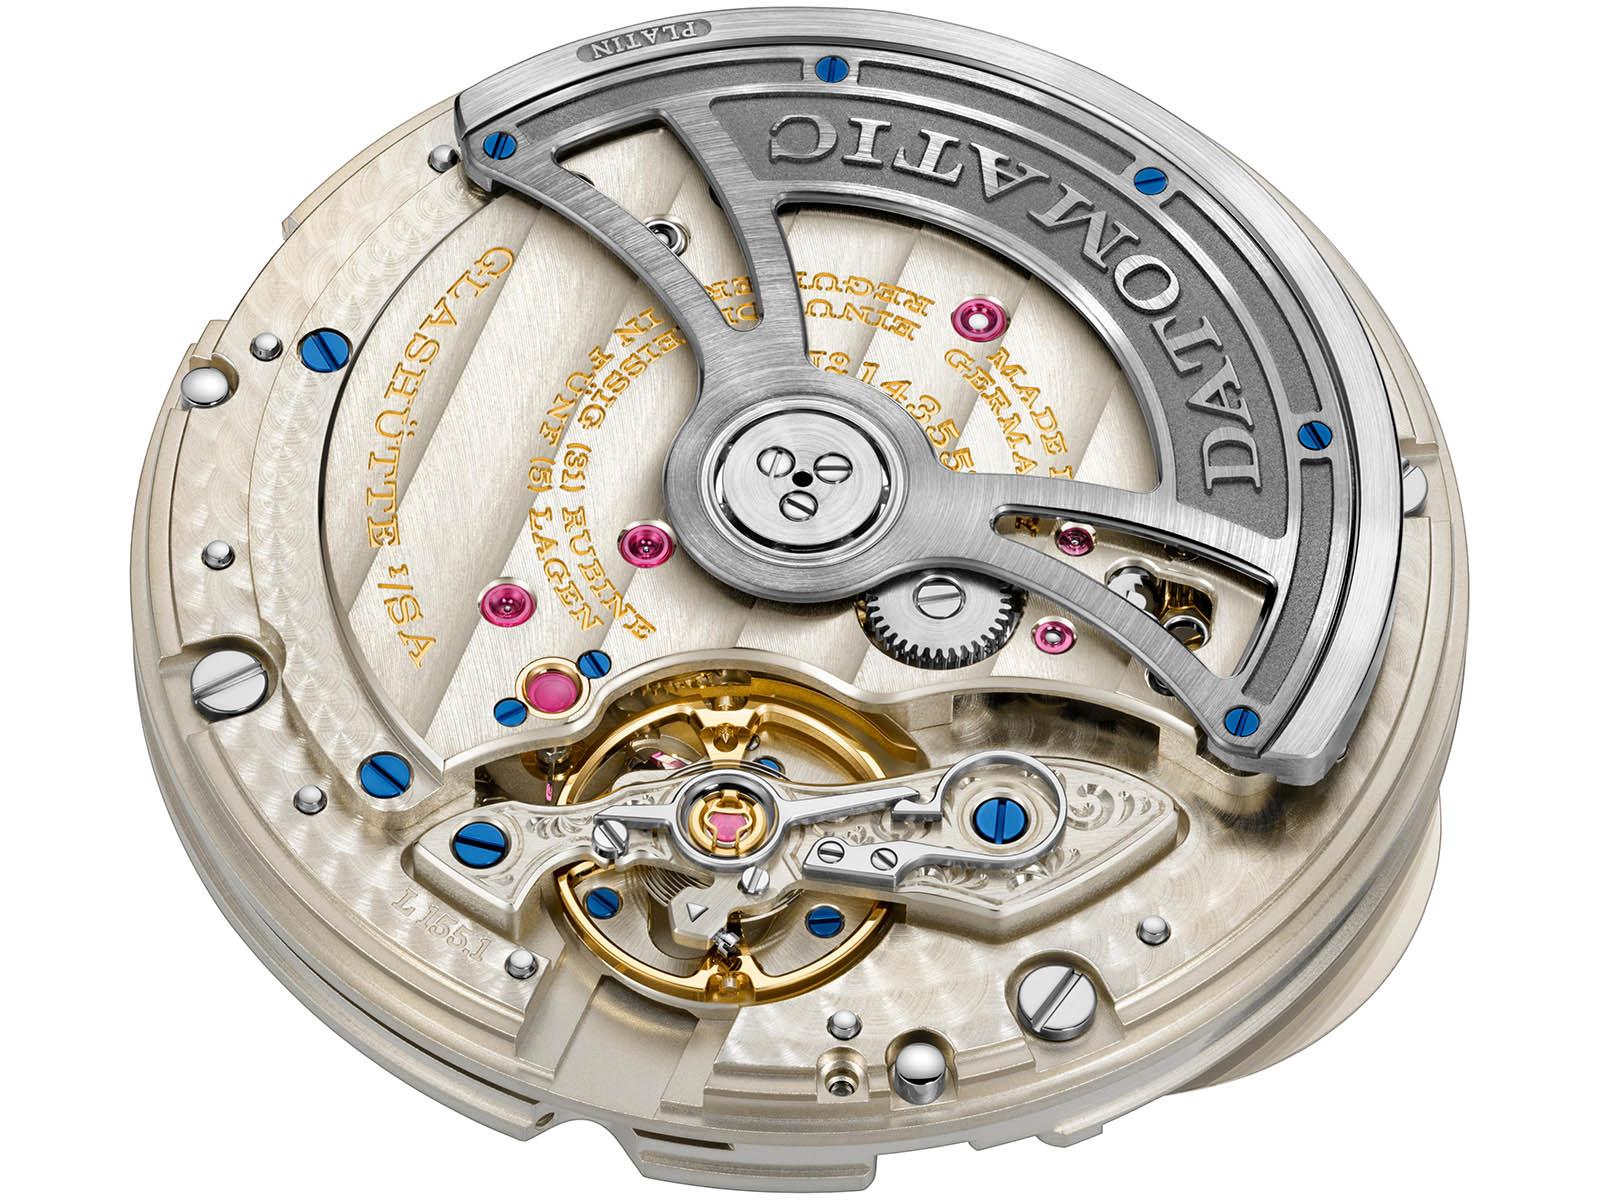 363-038-a-lange-sohne-odysseus-watch-wonders-2020-6.jpg